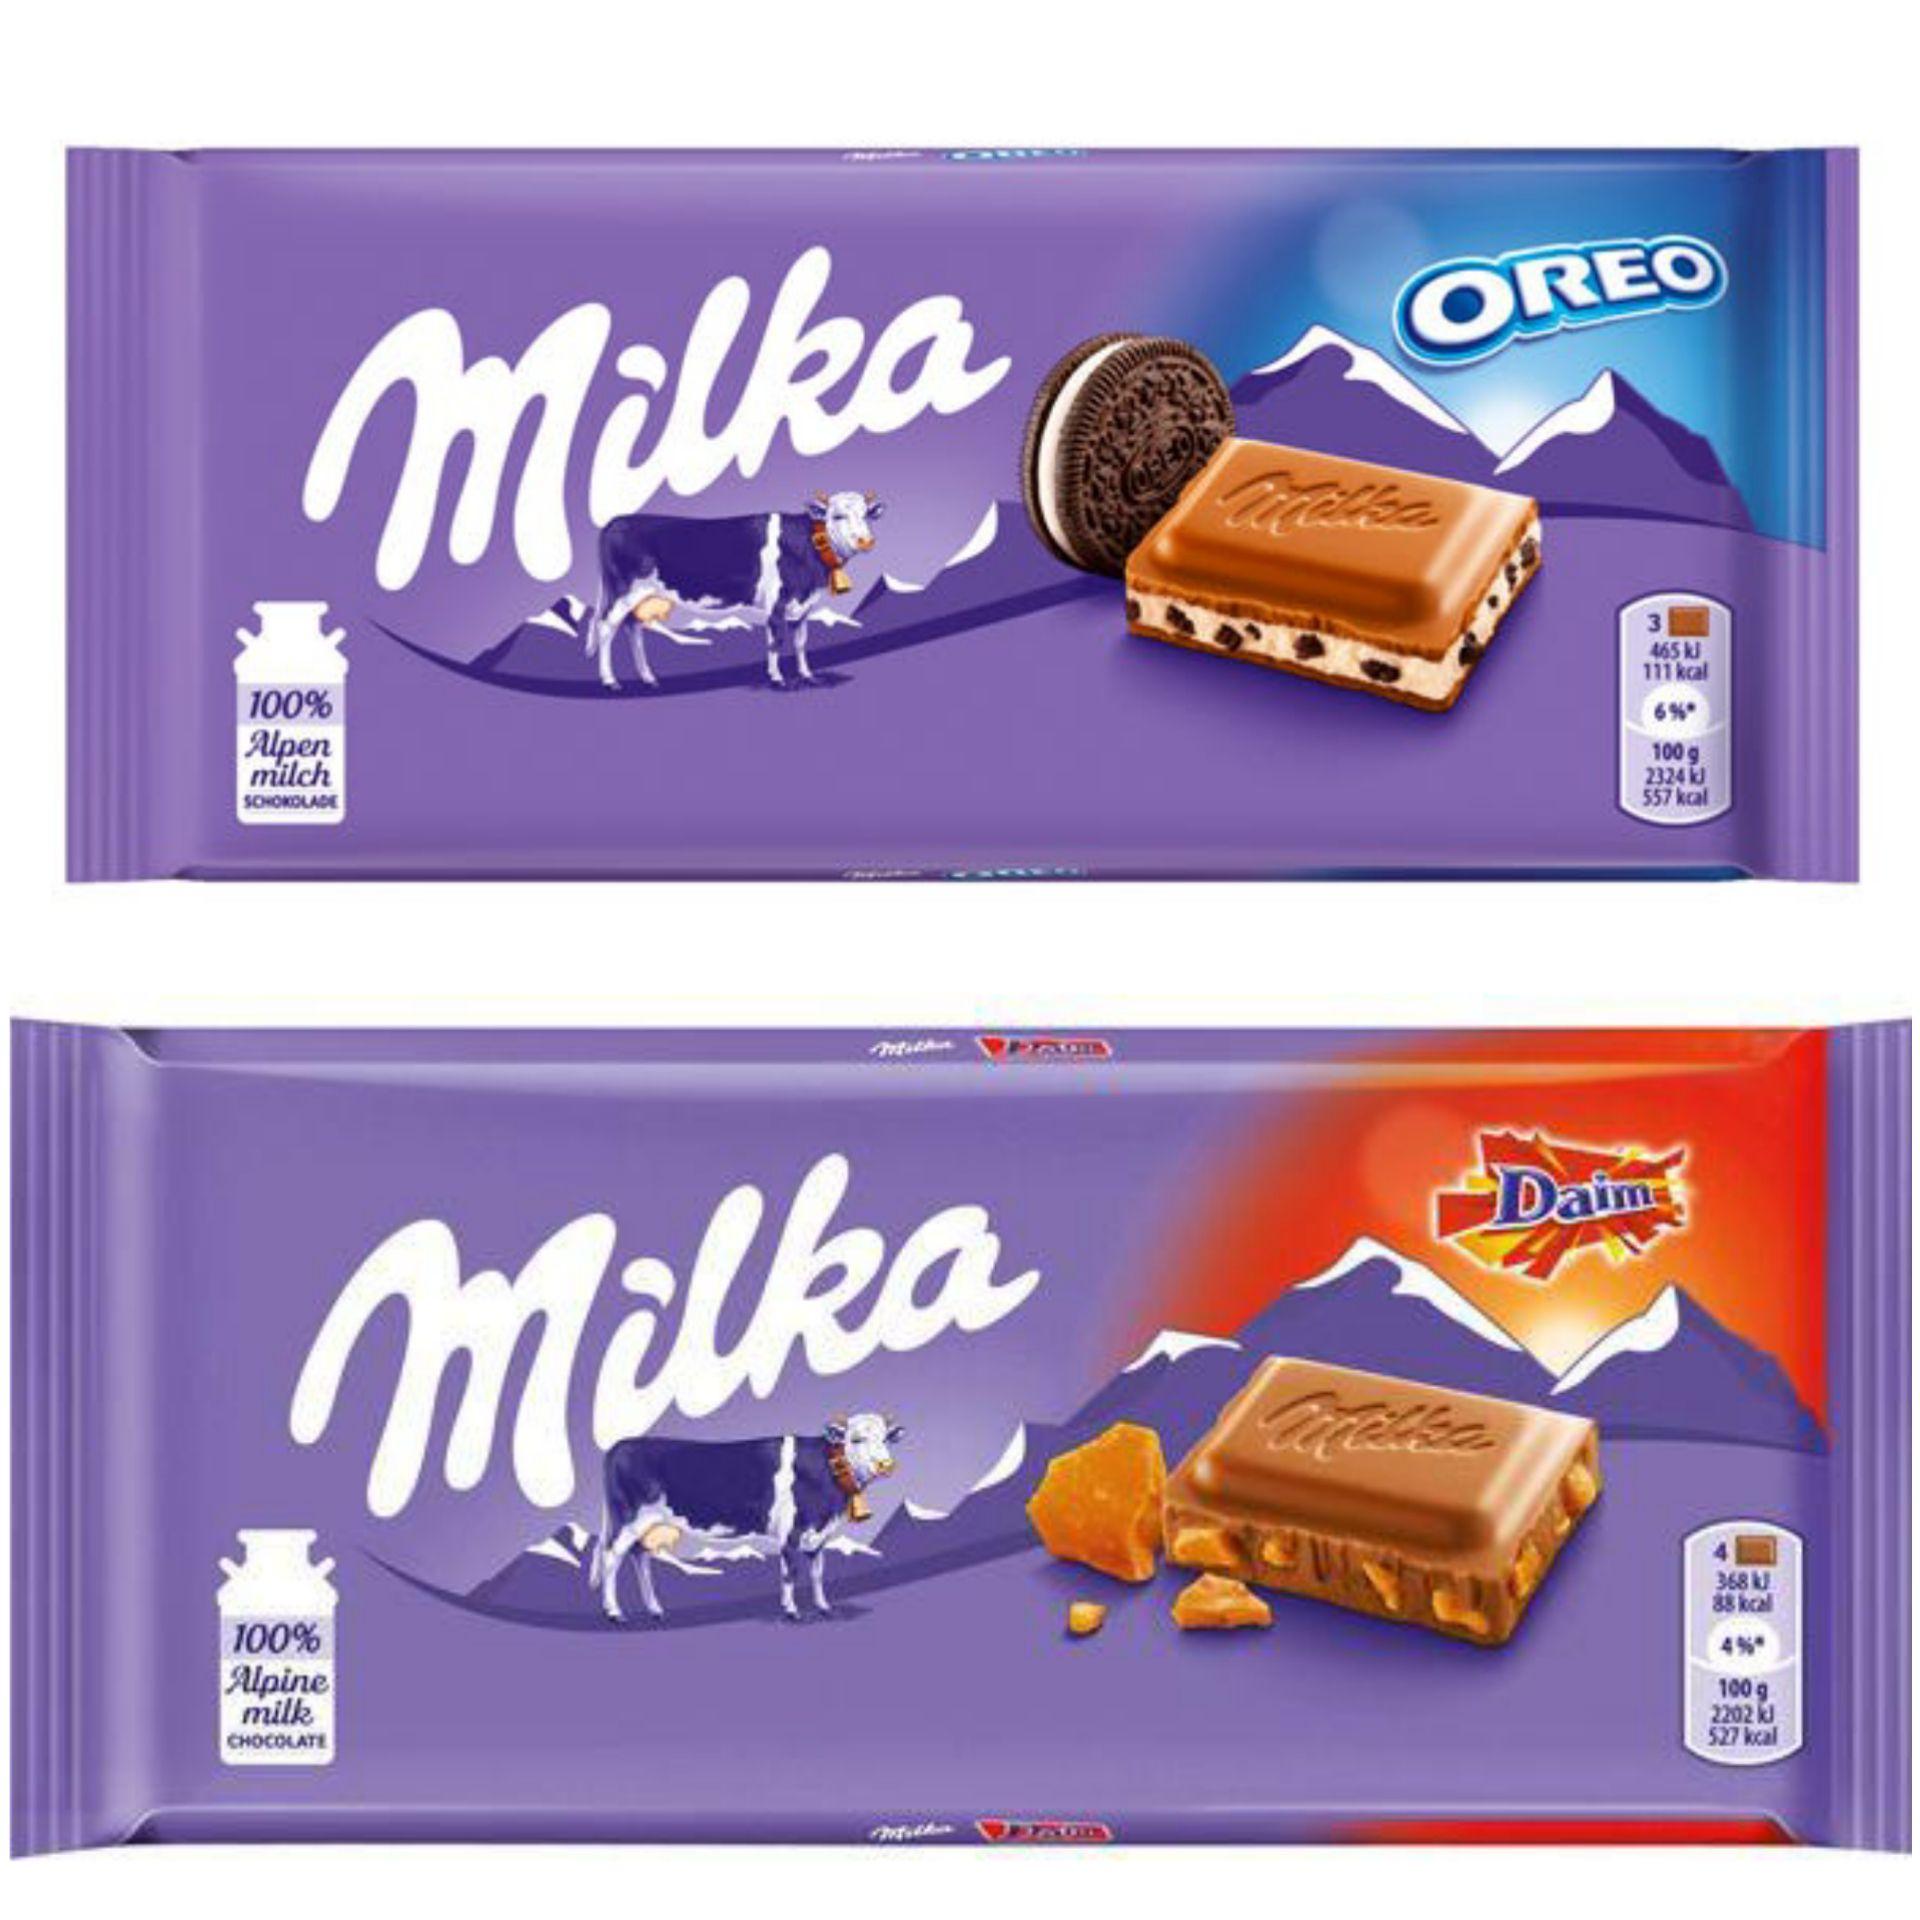 Milka Oreo/Daim bars 100g 75p @ Poundland Small Heath